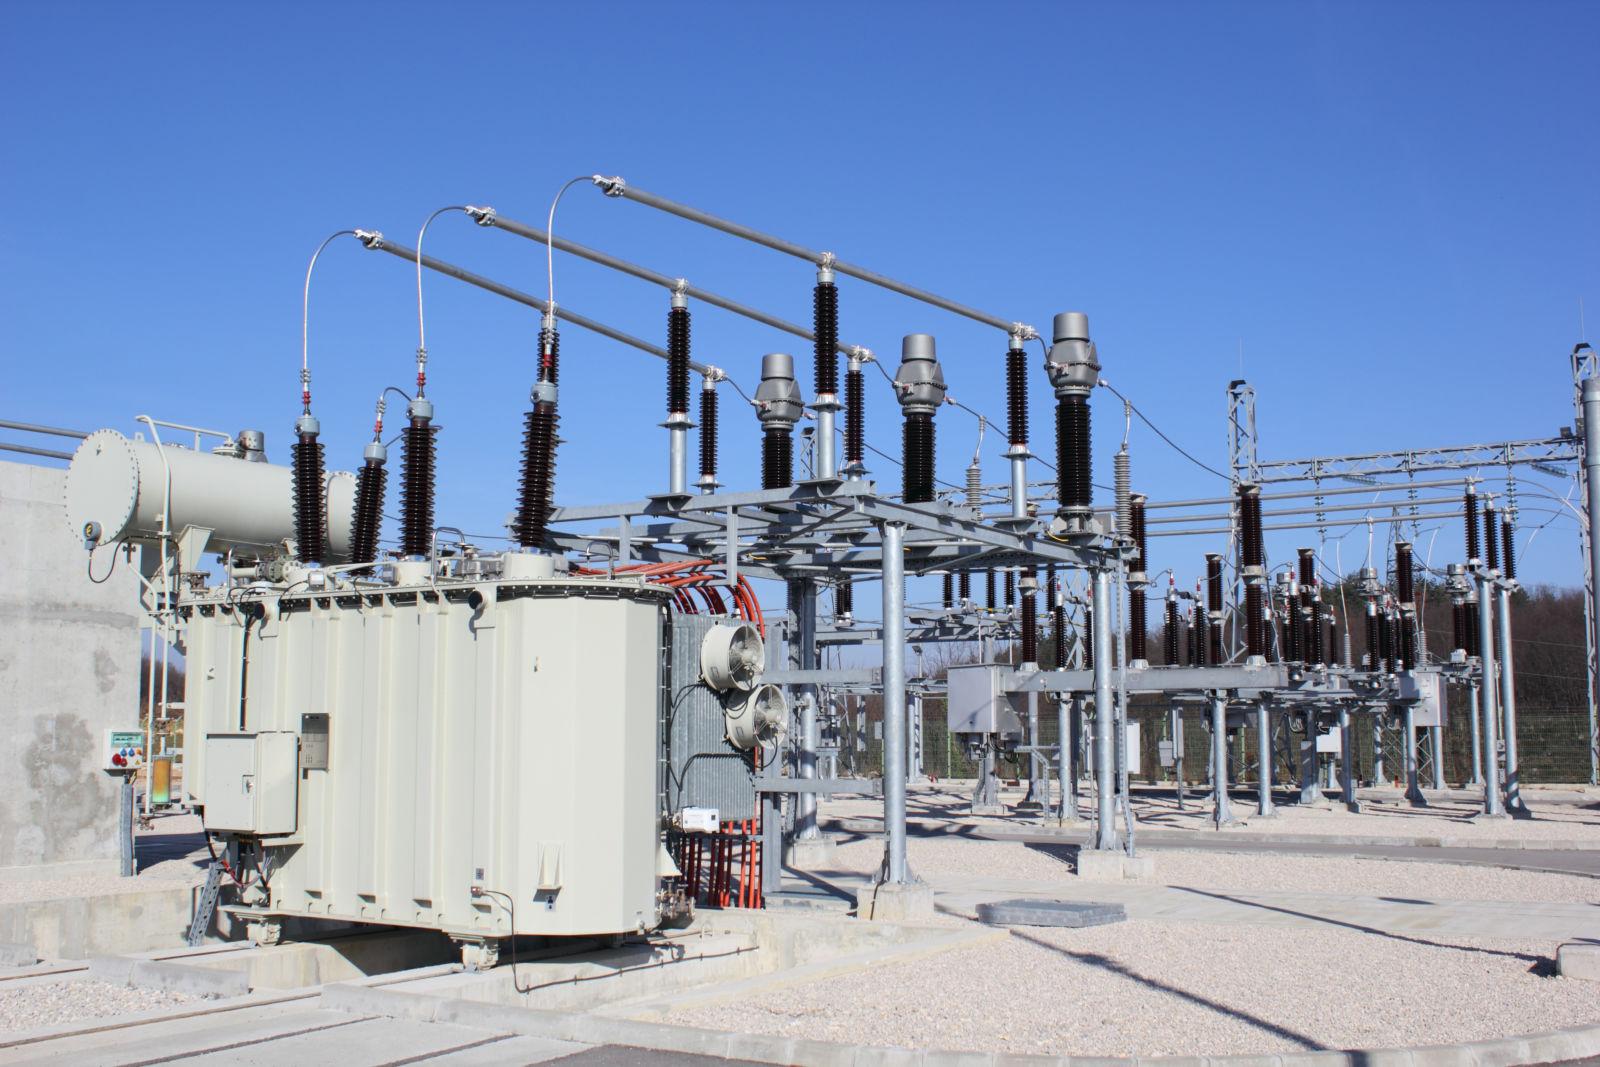 High voltage substation